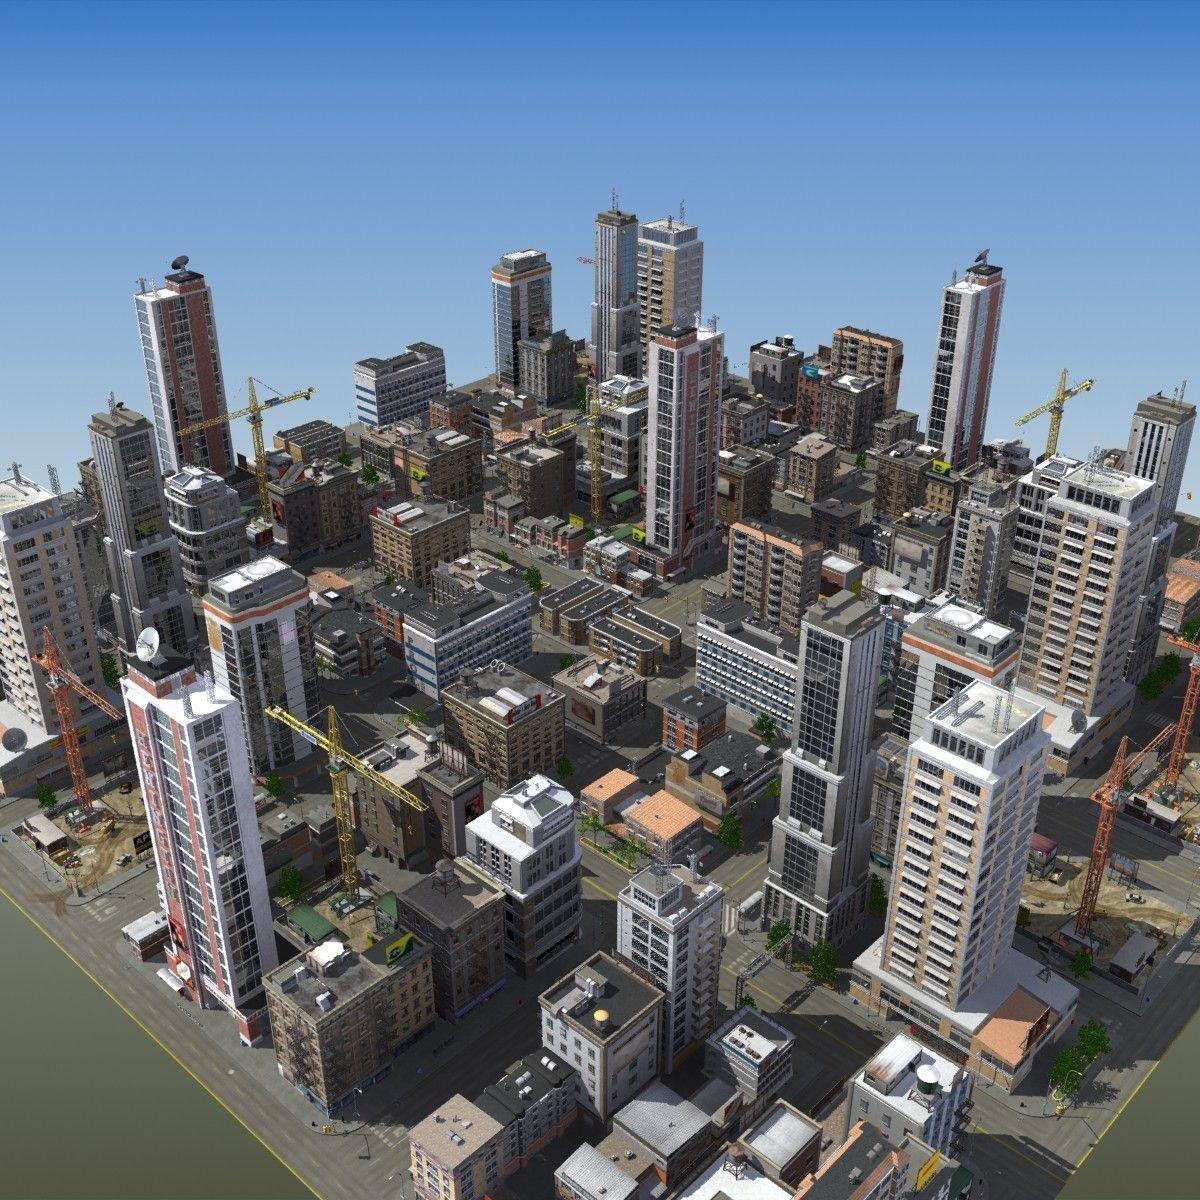 modular city buildings hd 3d max City